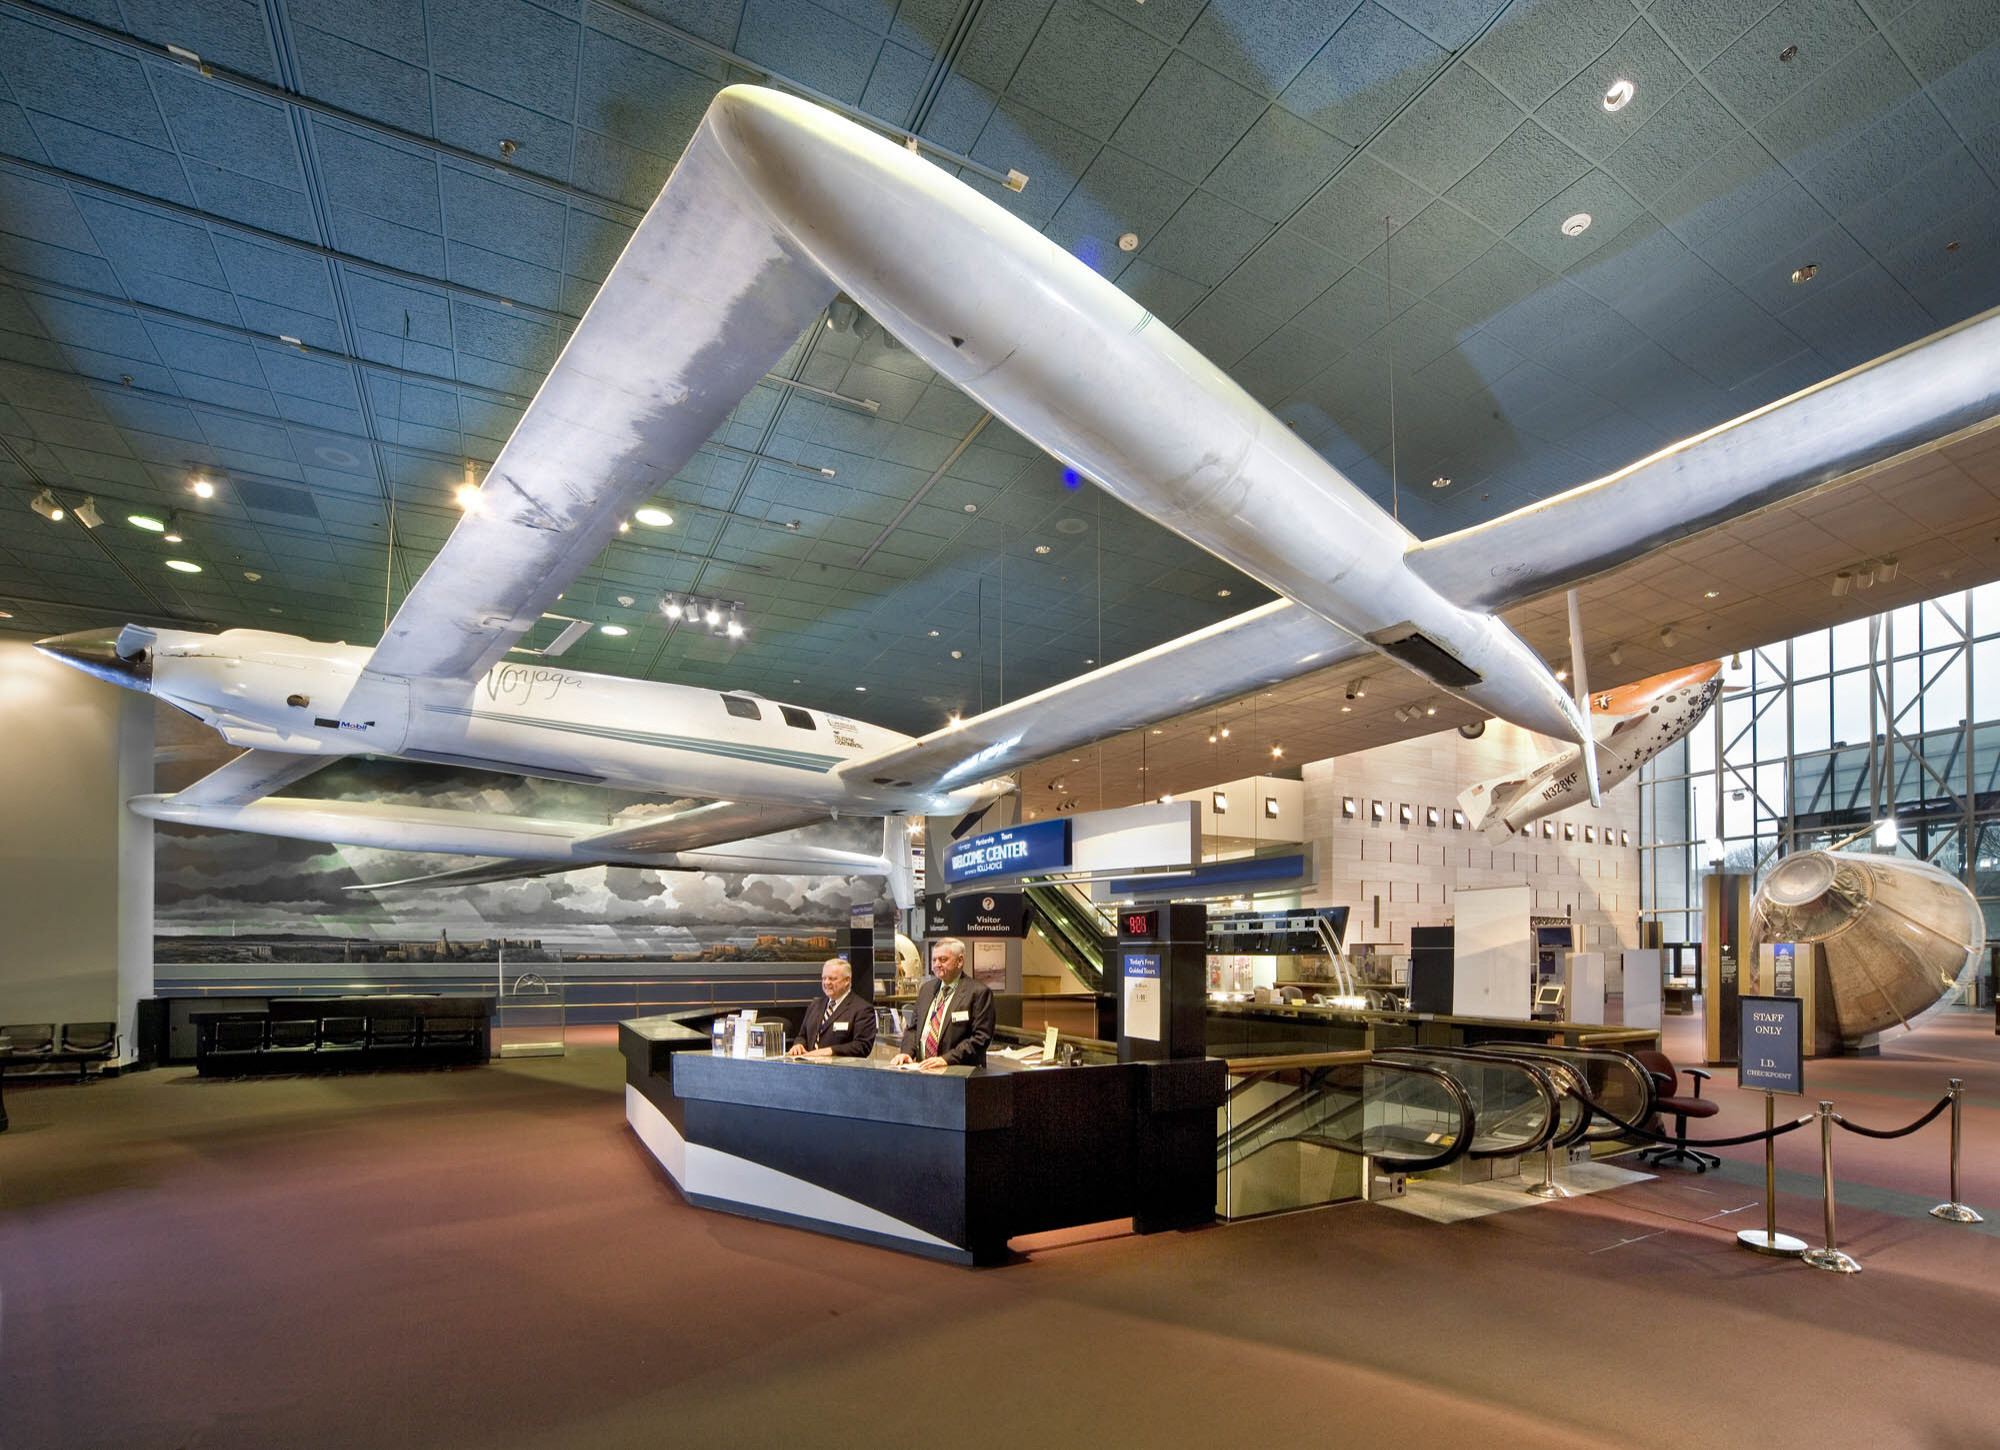 Rutan Voyager in Museum